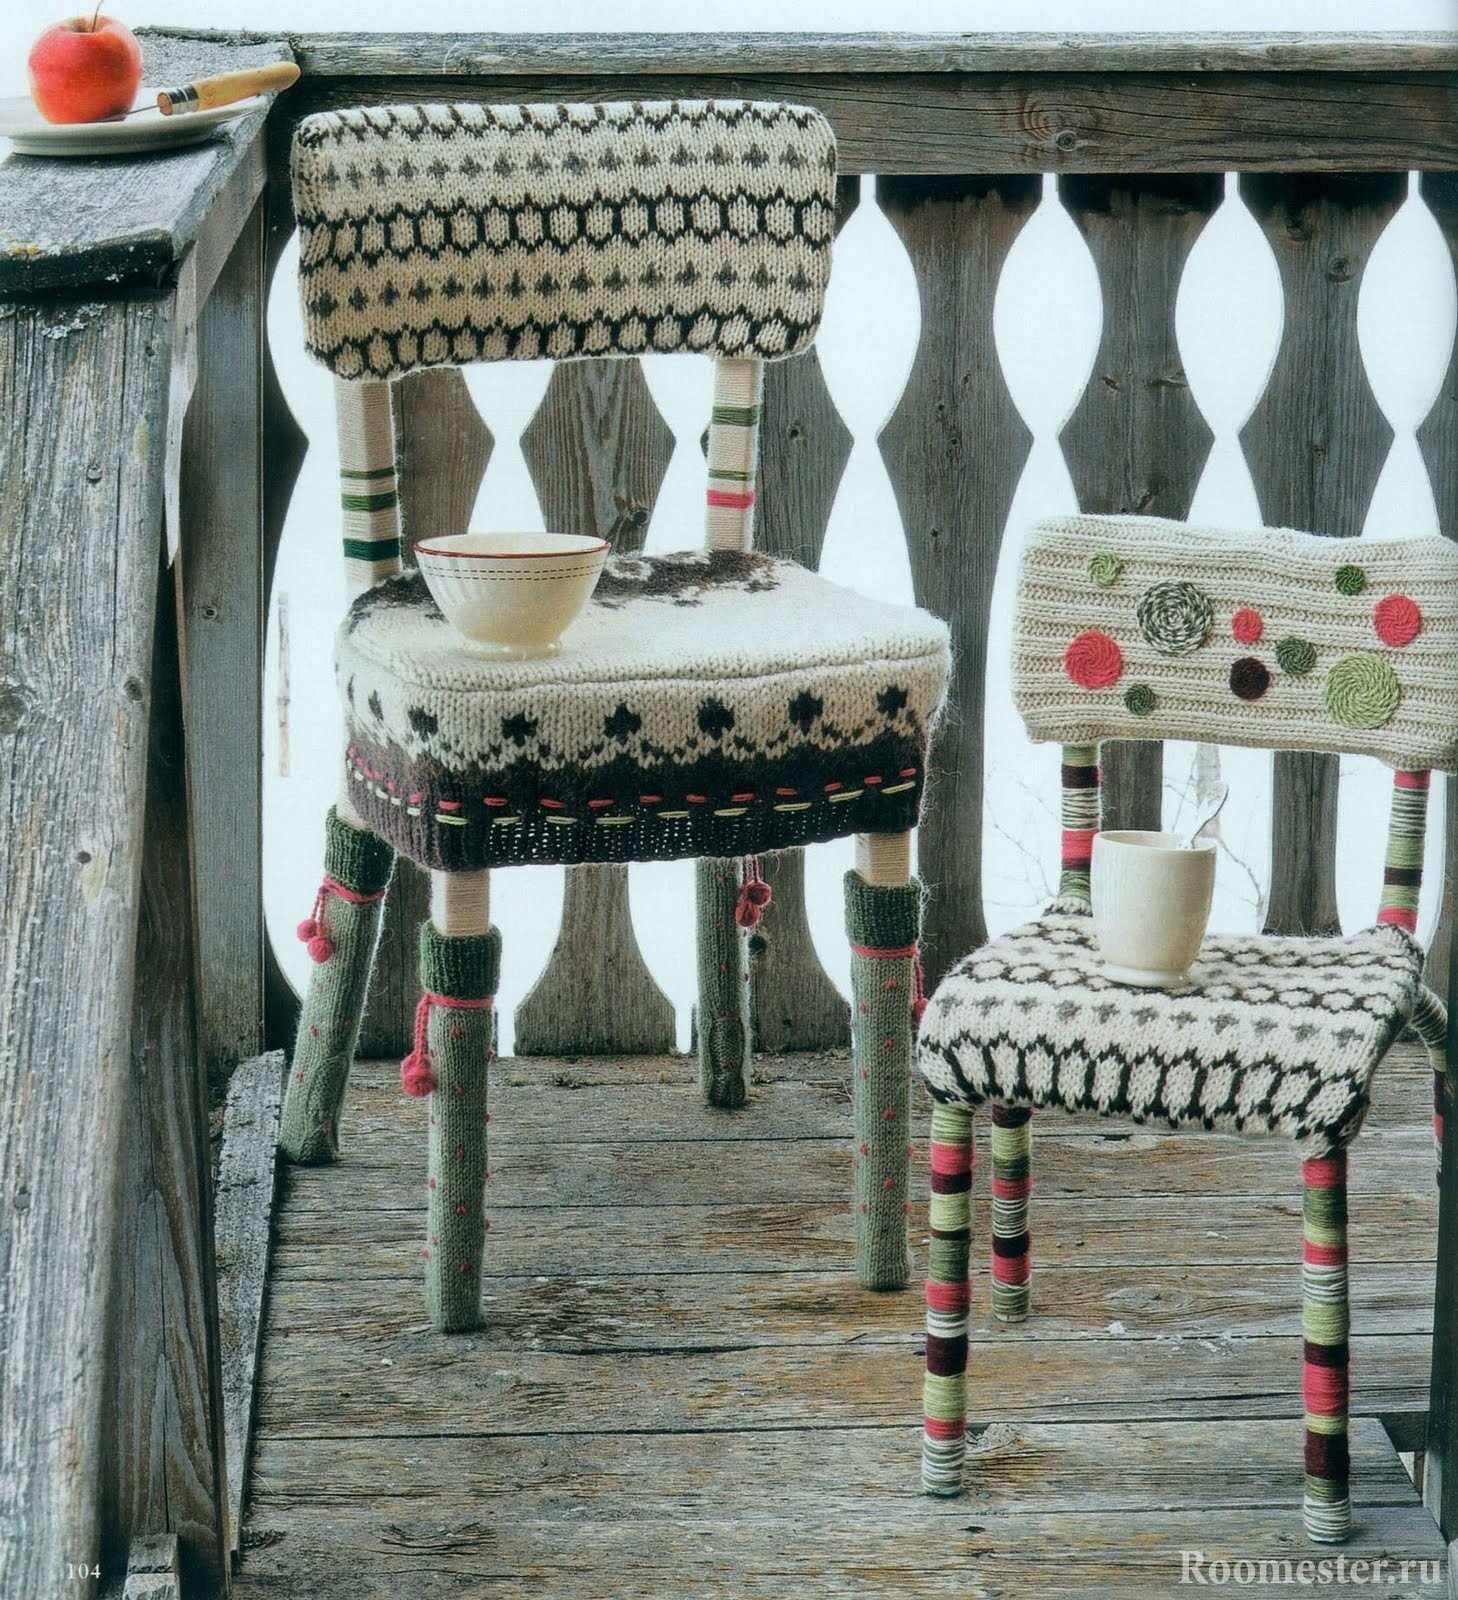 Стул с вязанным чехлом на сидушку, спинку и ножки